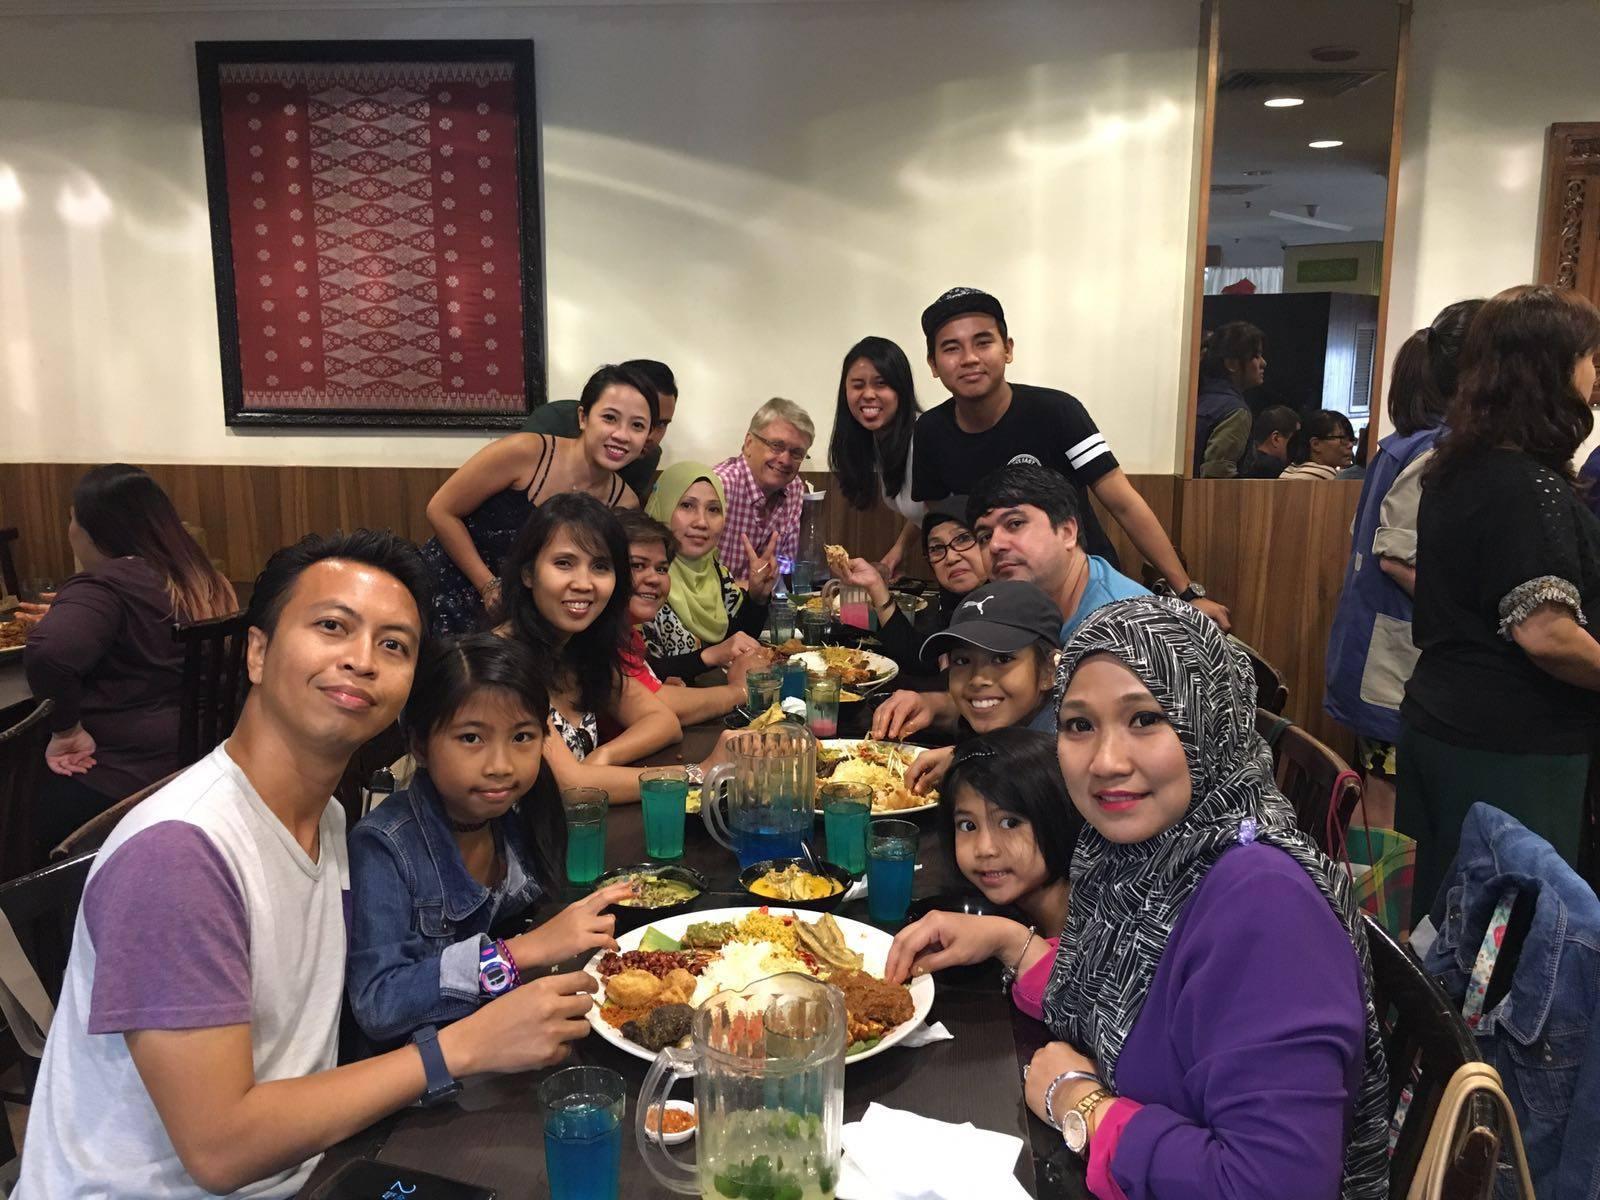 Makan-places-ramadan-venuerific-blog-pu3-restaurant-family-gathering